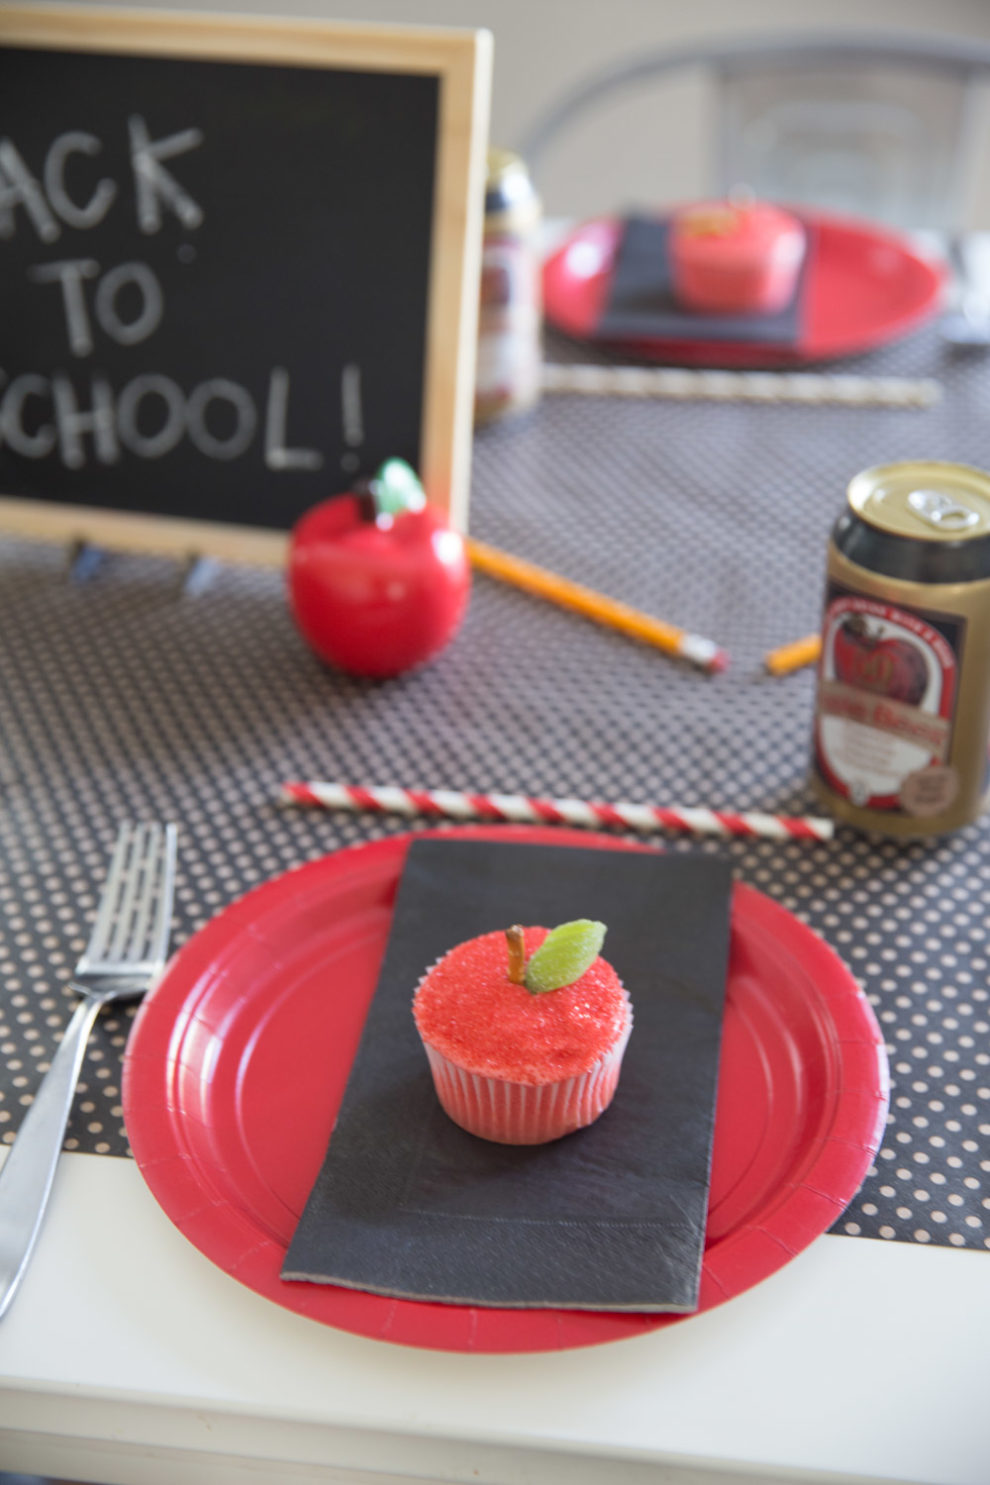 Back to school dinner 2017